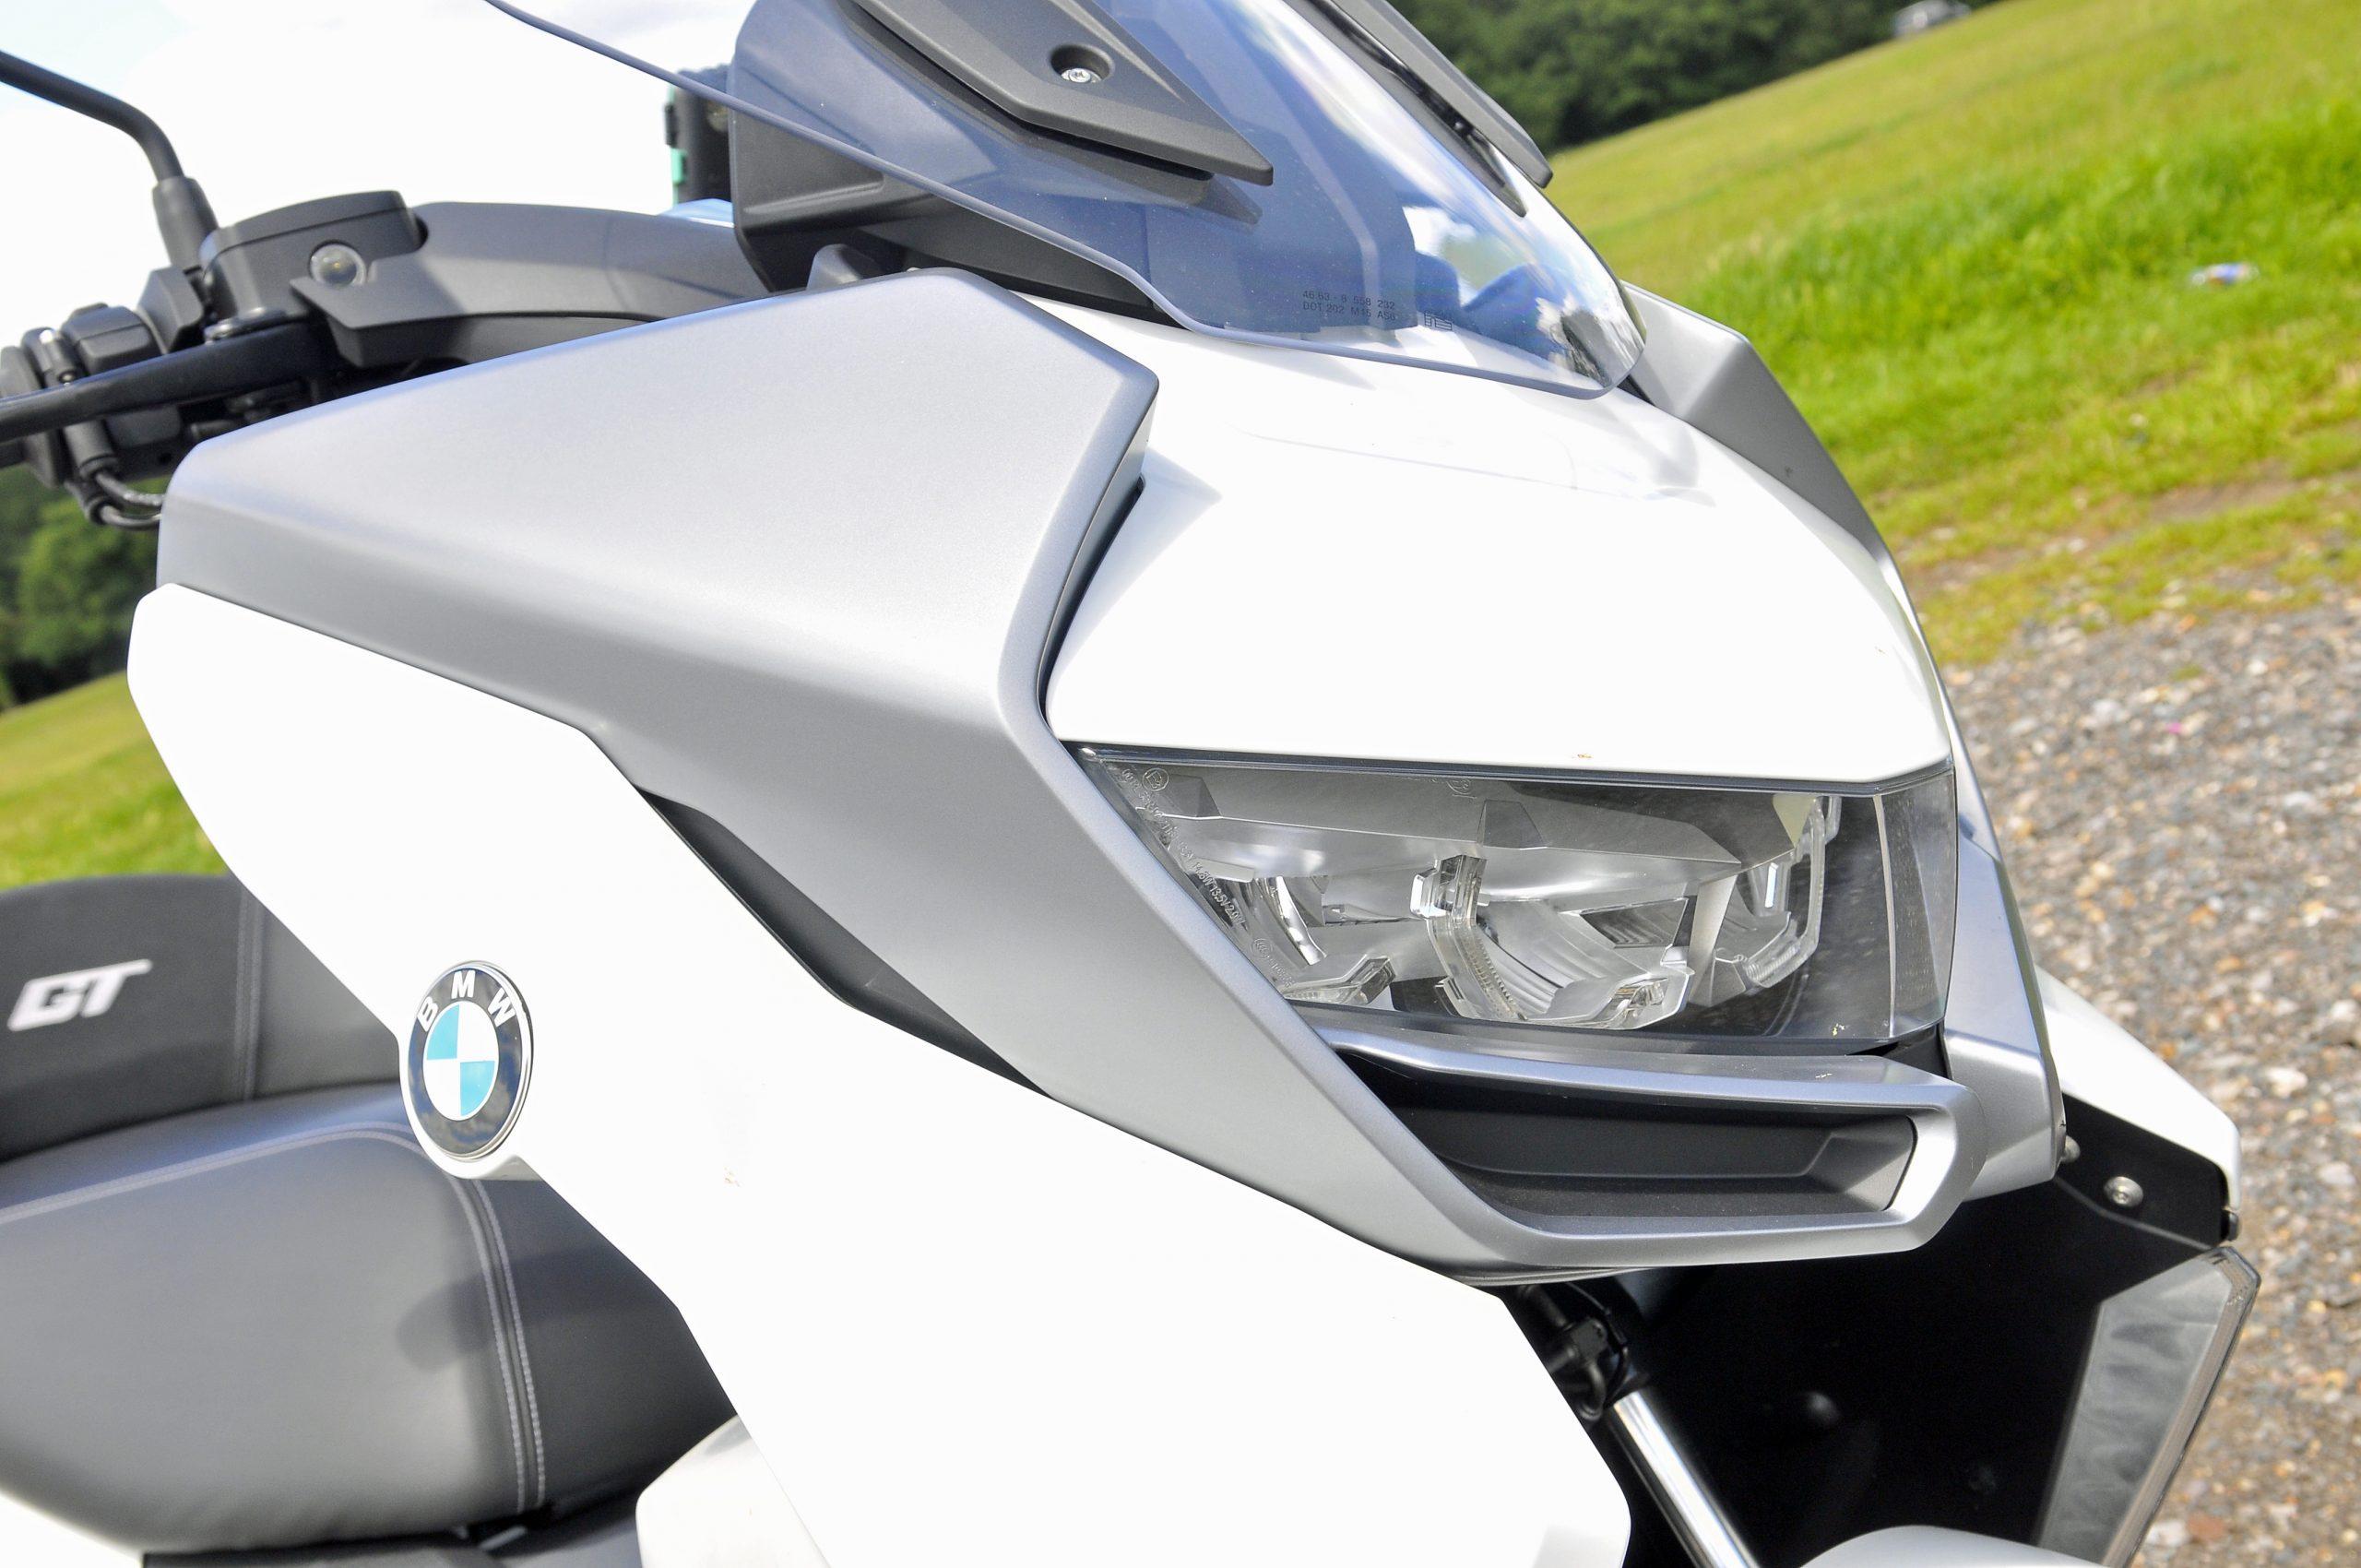 Headlights on BMW C400 GT